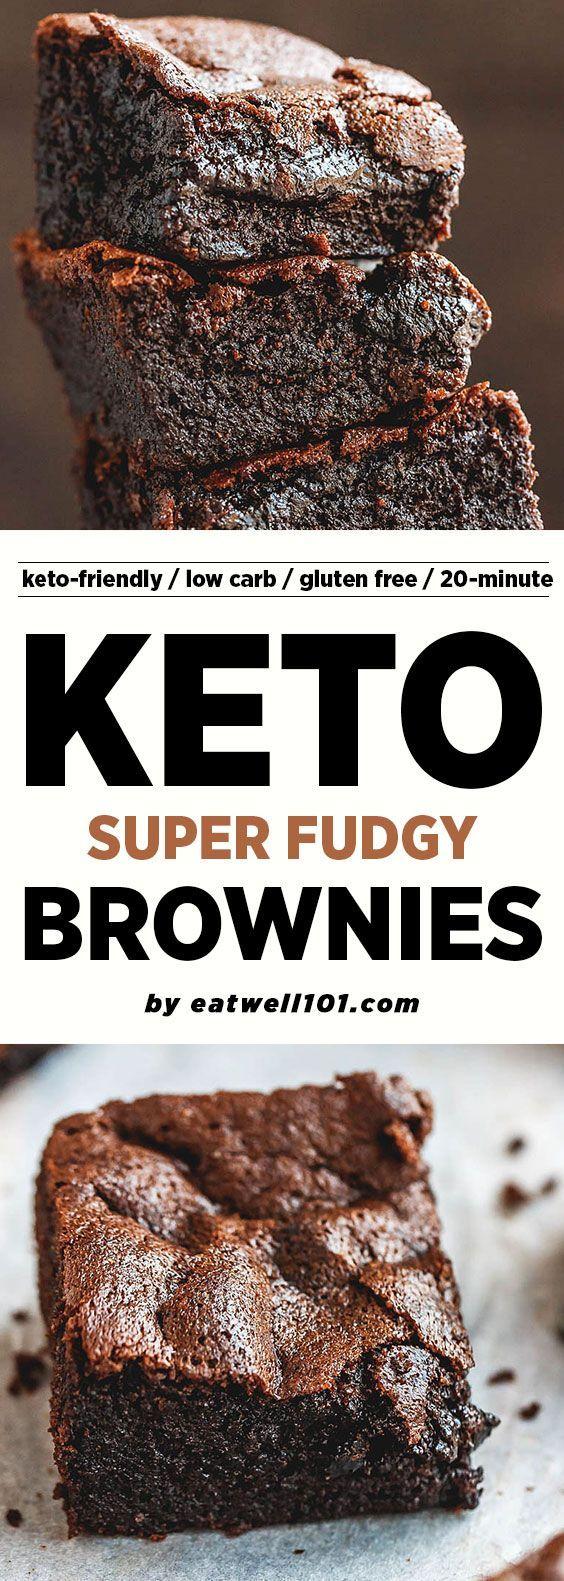 Super Fudgy Low-Carb Keto Brownies Recipe -  Low Carb Keto Brownies – Low carb, keto, fudgy, and